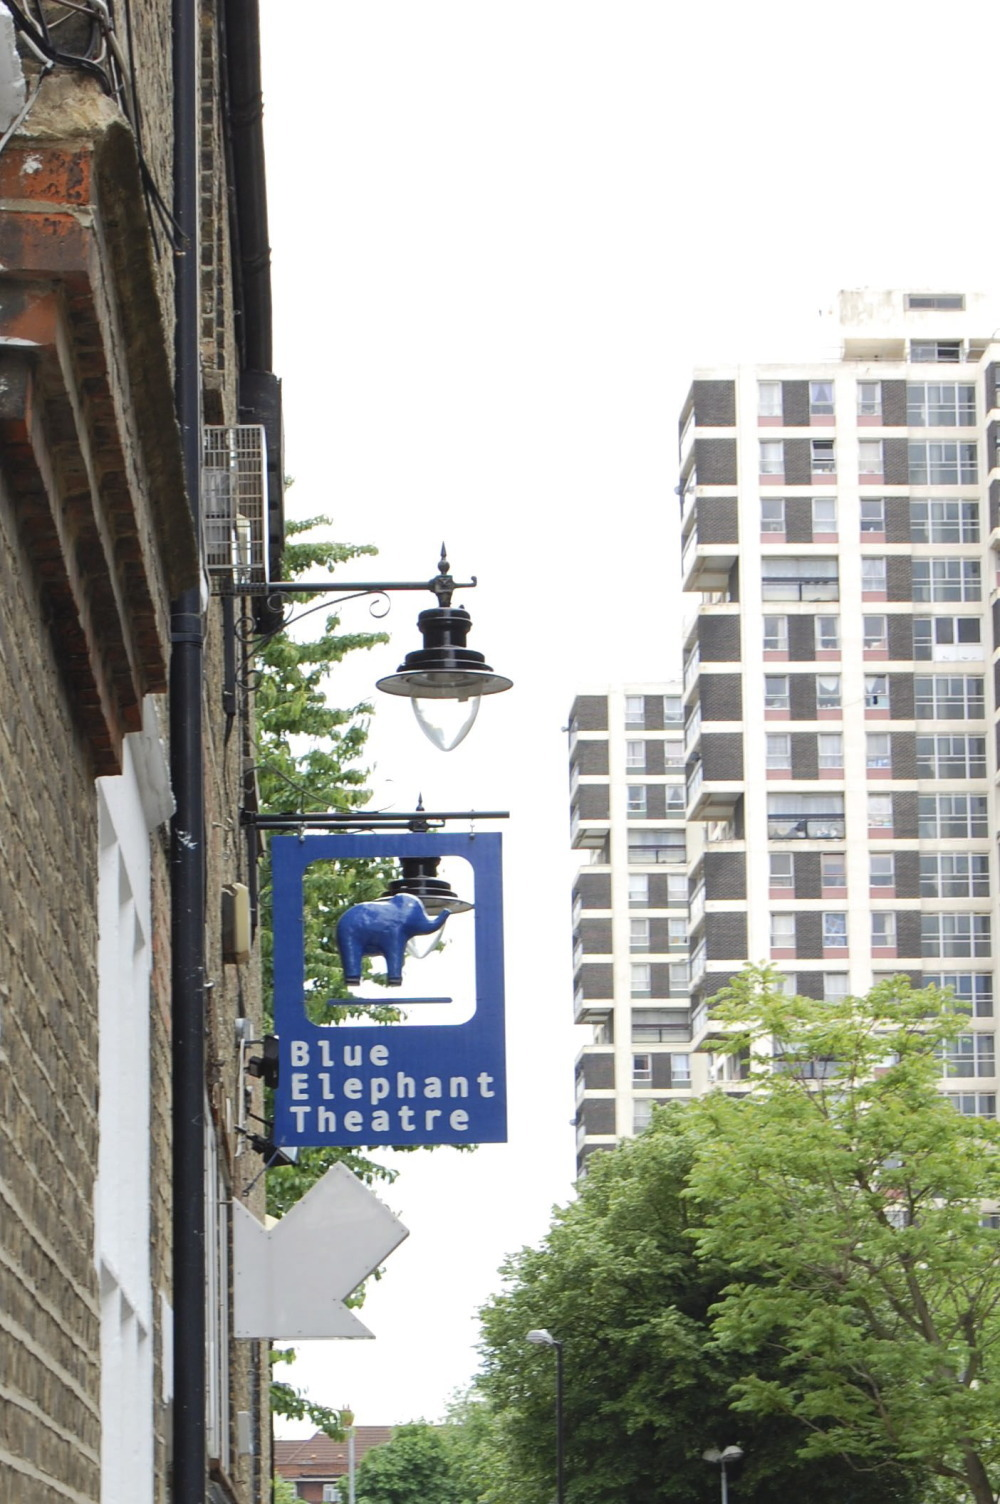 Blue Elephant Theatre